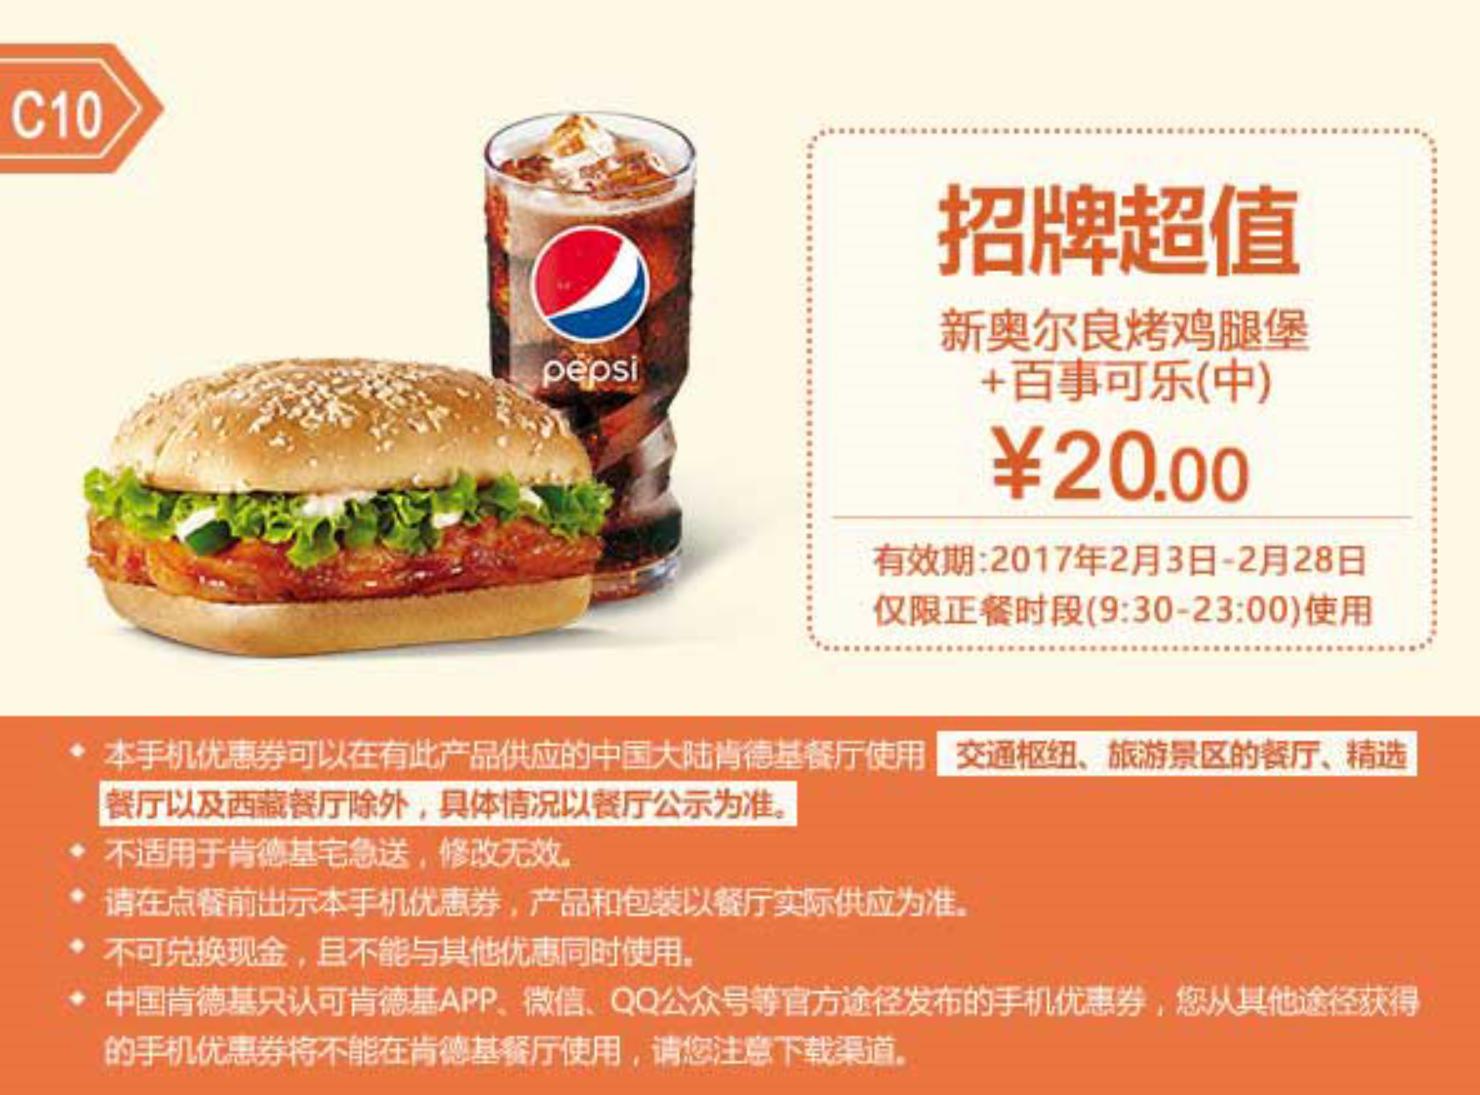 C10新奥尔良烤鸡腿堡+百事可乐(中)